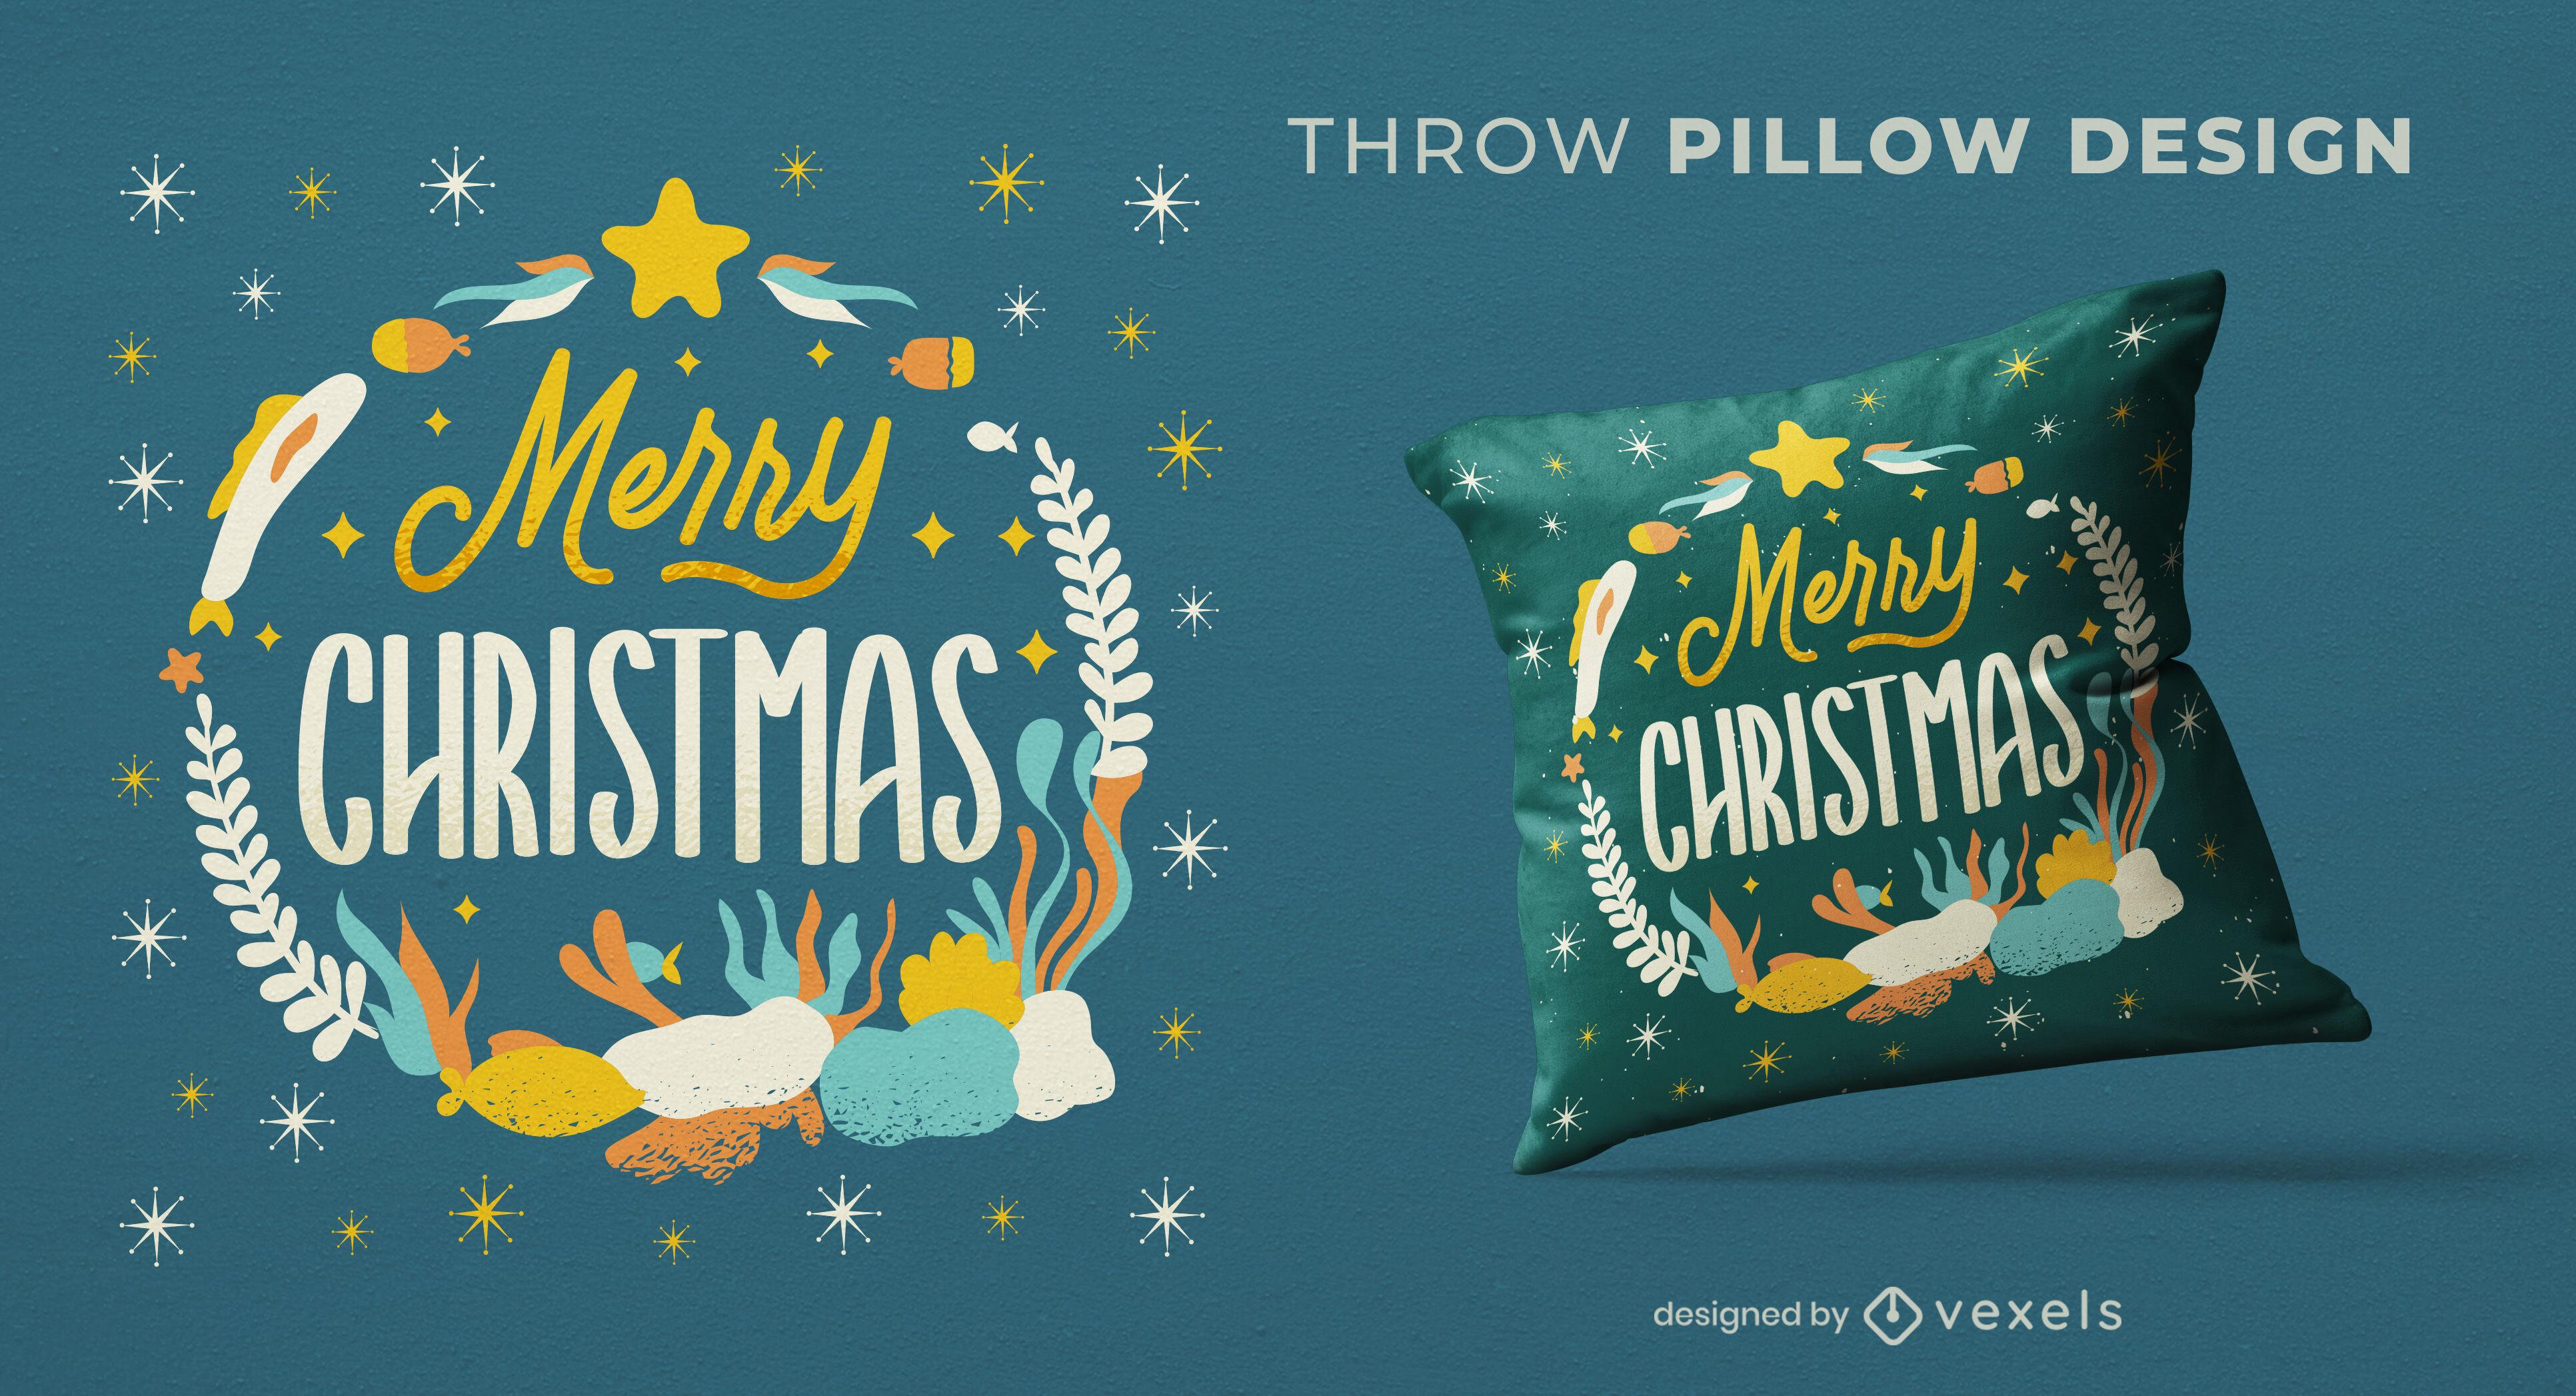 Merry christmas underwater throw pillow